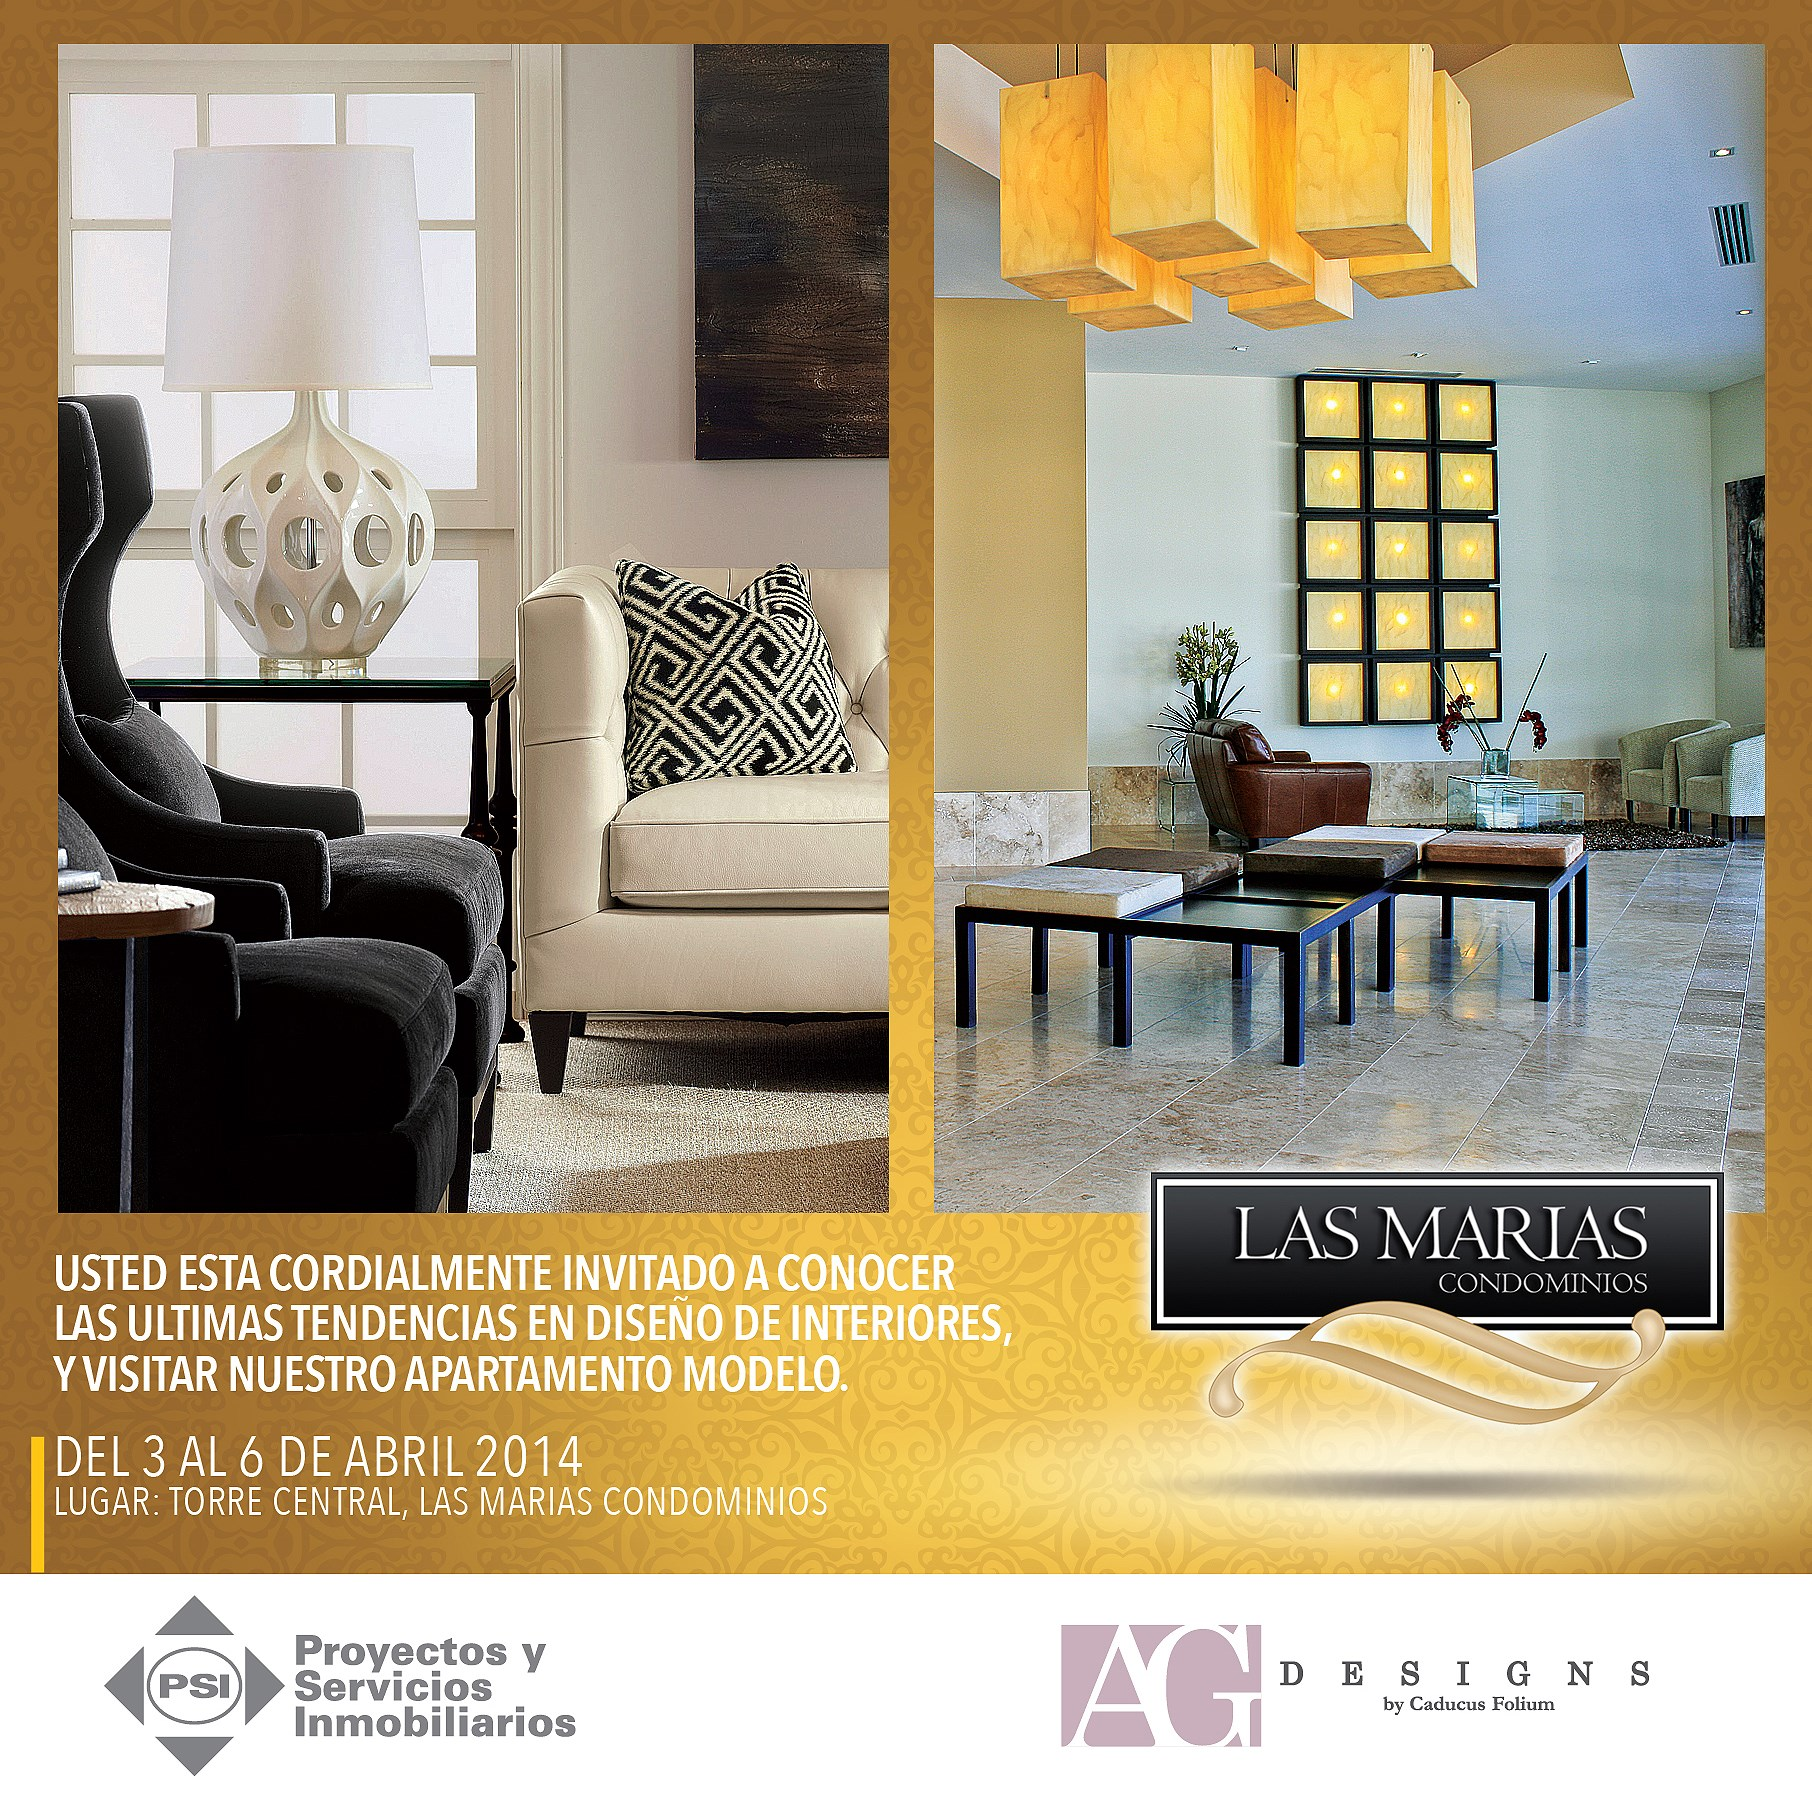 Las Marias Condominios and AG Designs team up for architecture and design sensations